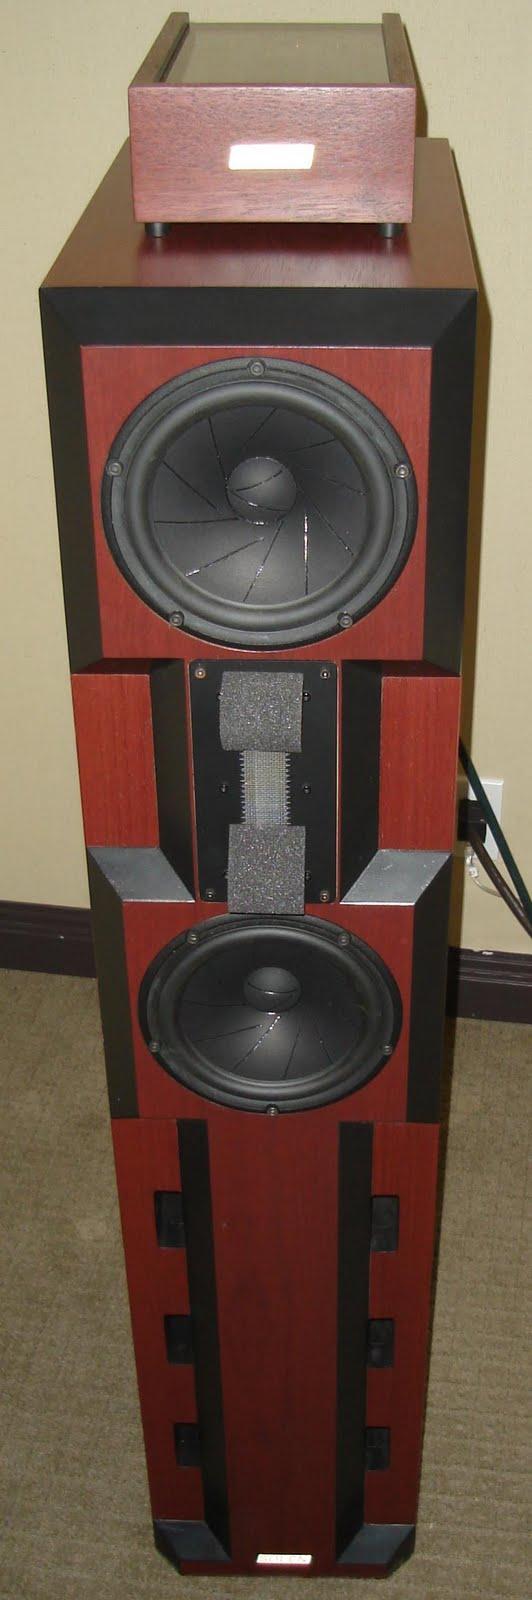 DIY Audio Projects - Hi-Fi Blog for DIY Audiophiles: Salon ...